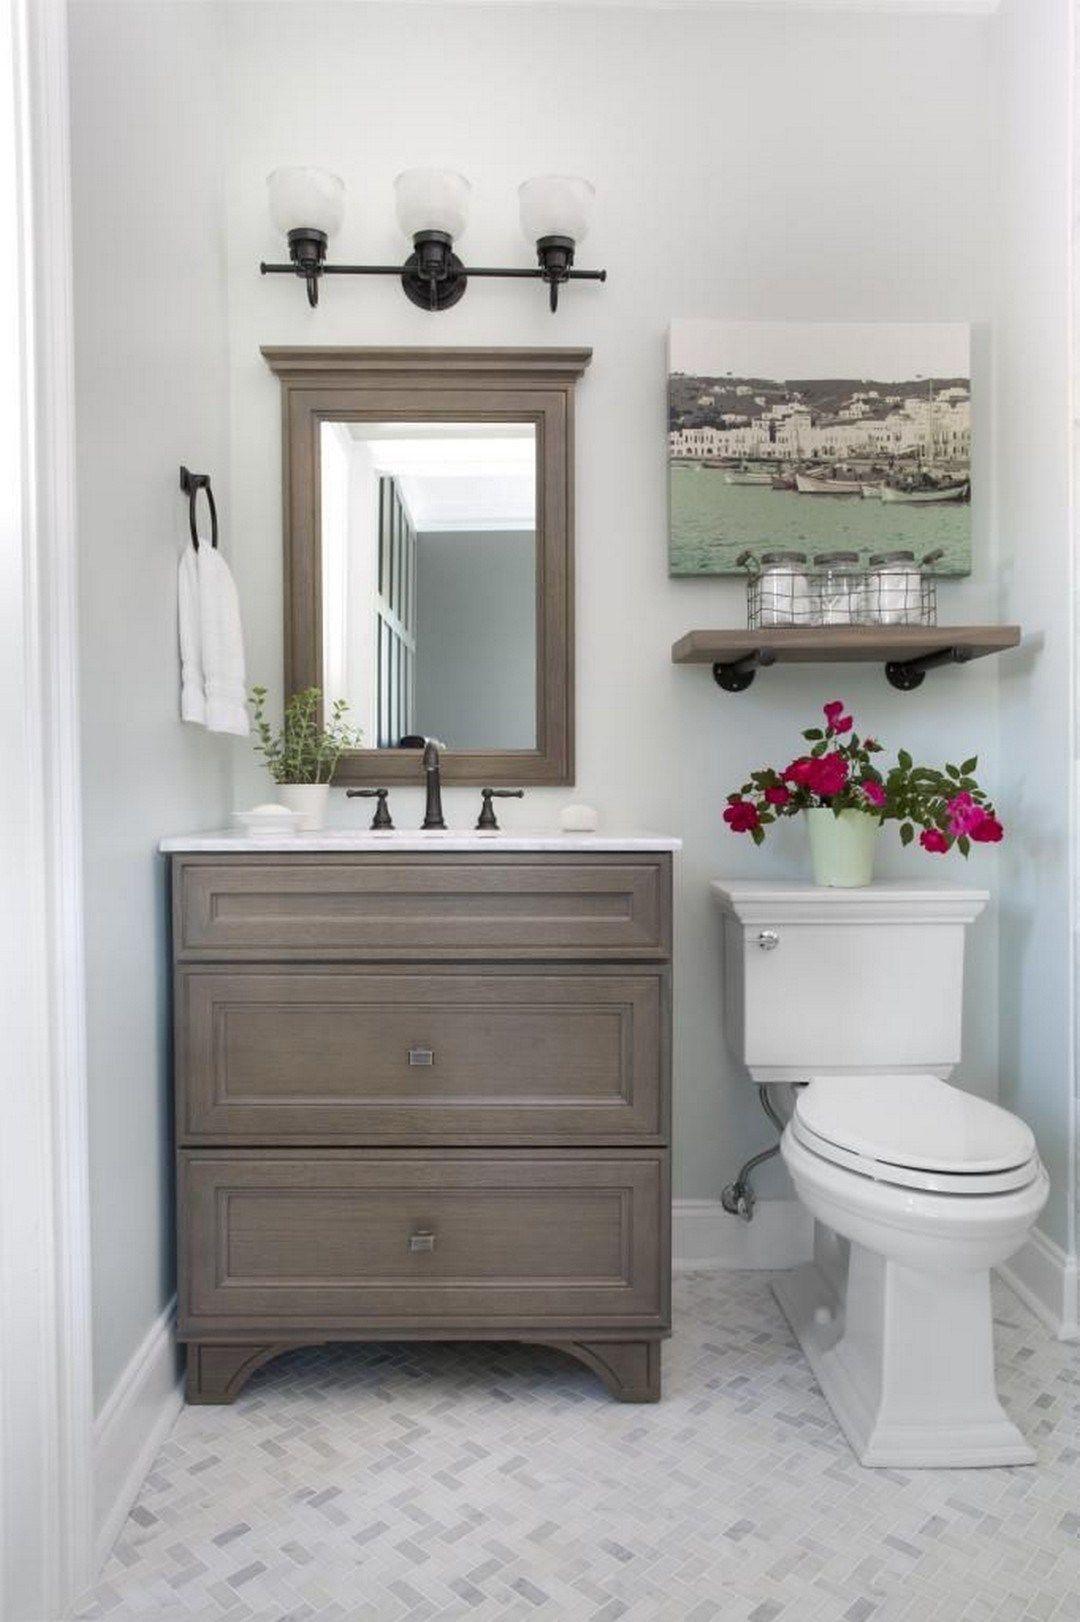 99 Small Master Bathroom Makeover Ideas On A Budget 104  Home Inspiration Small Bathroom Makeover Ideas Inspiration Design